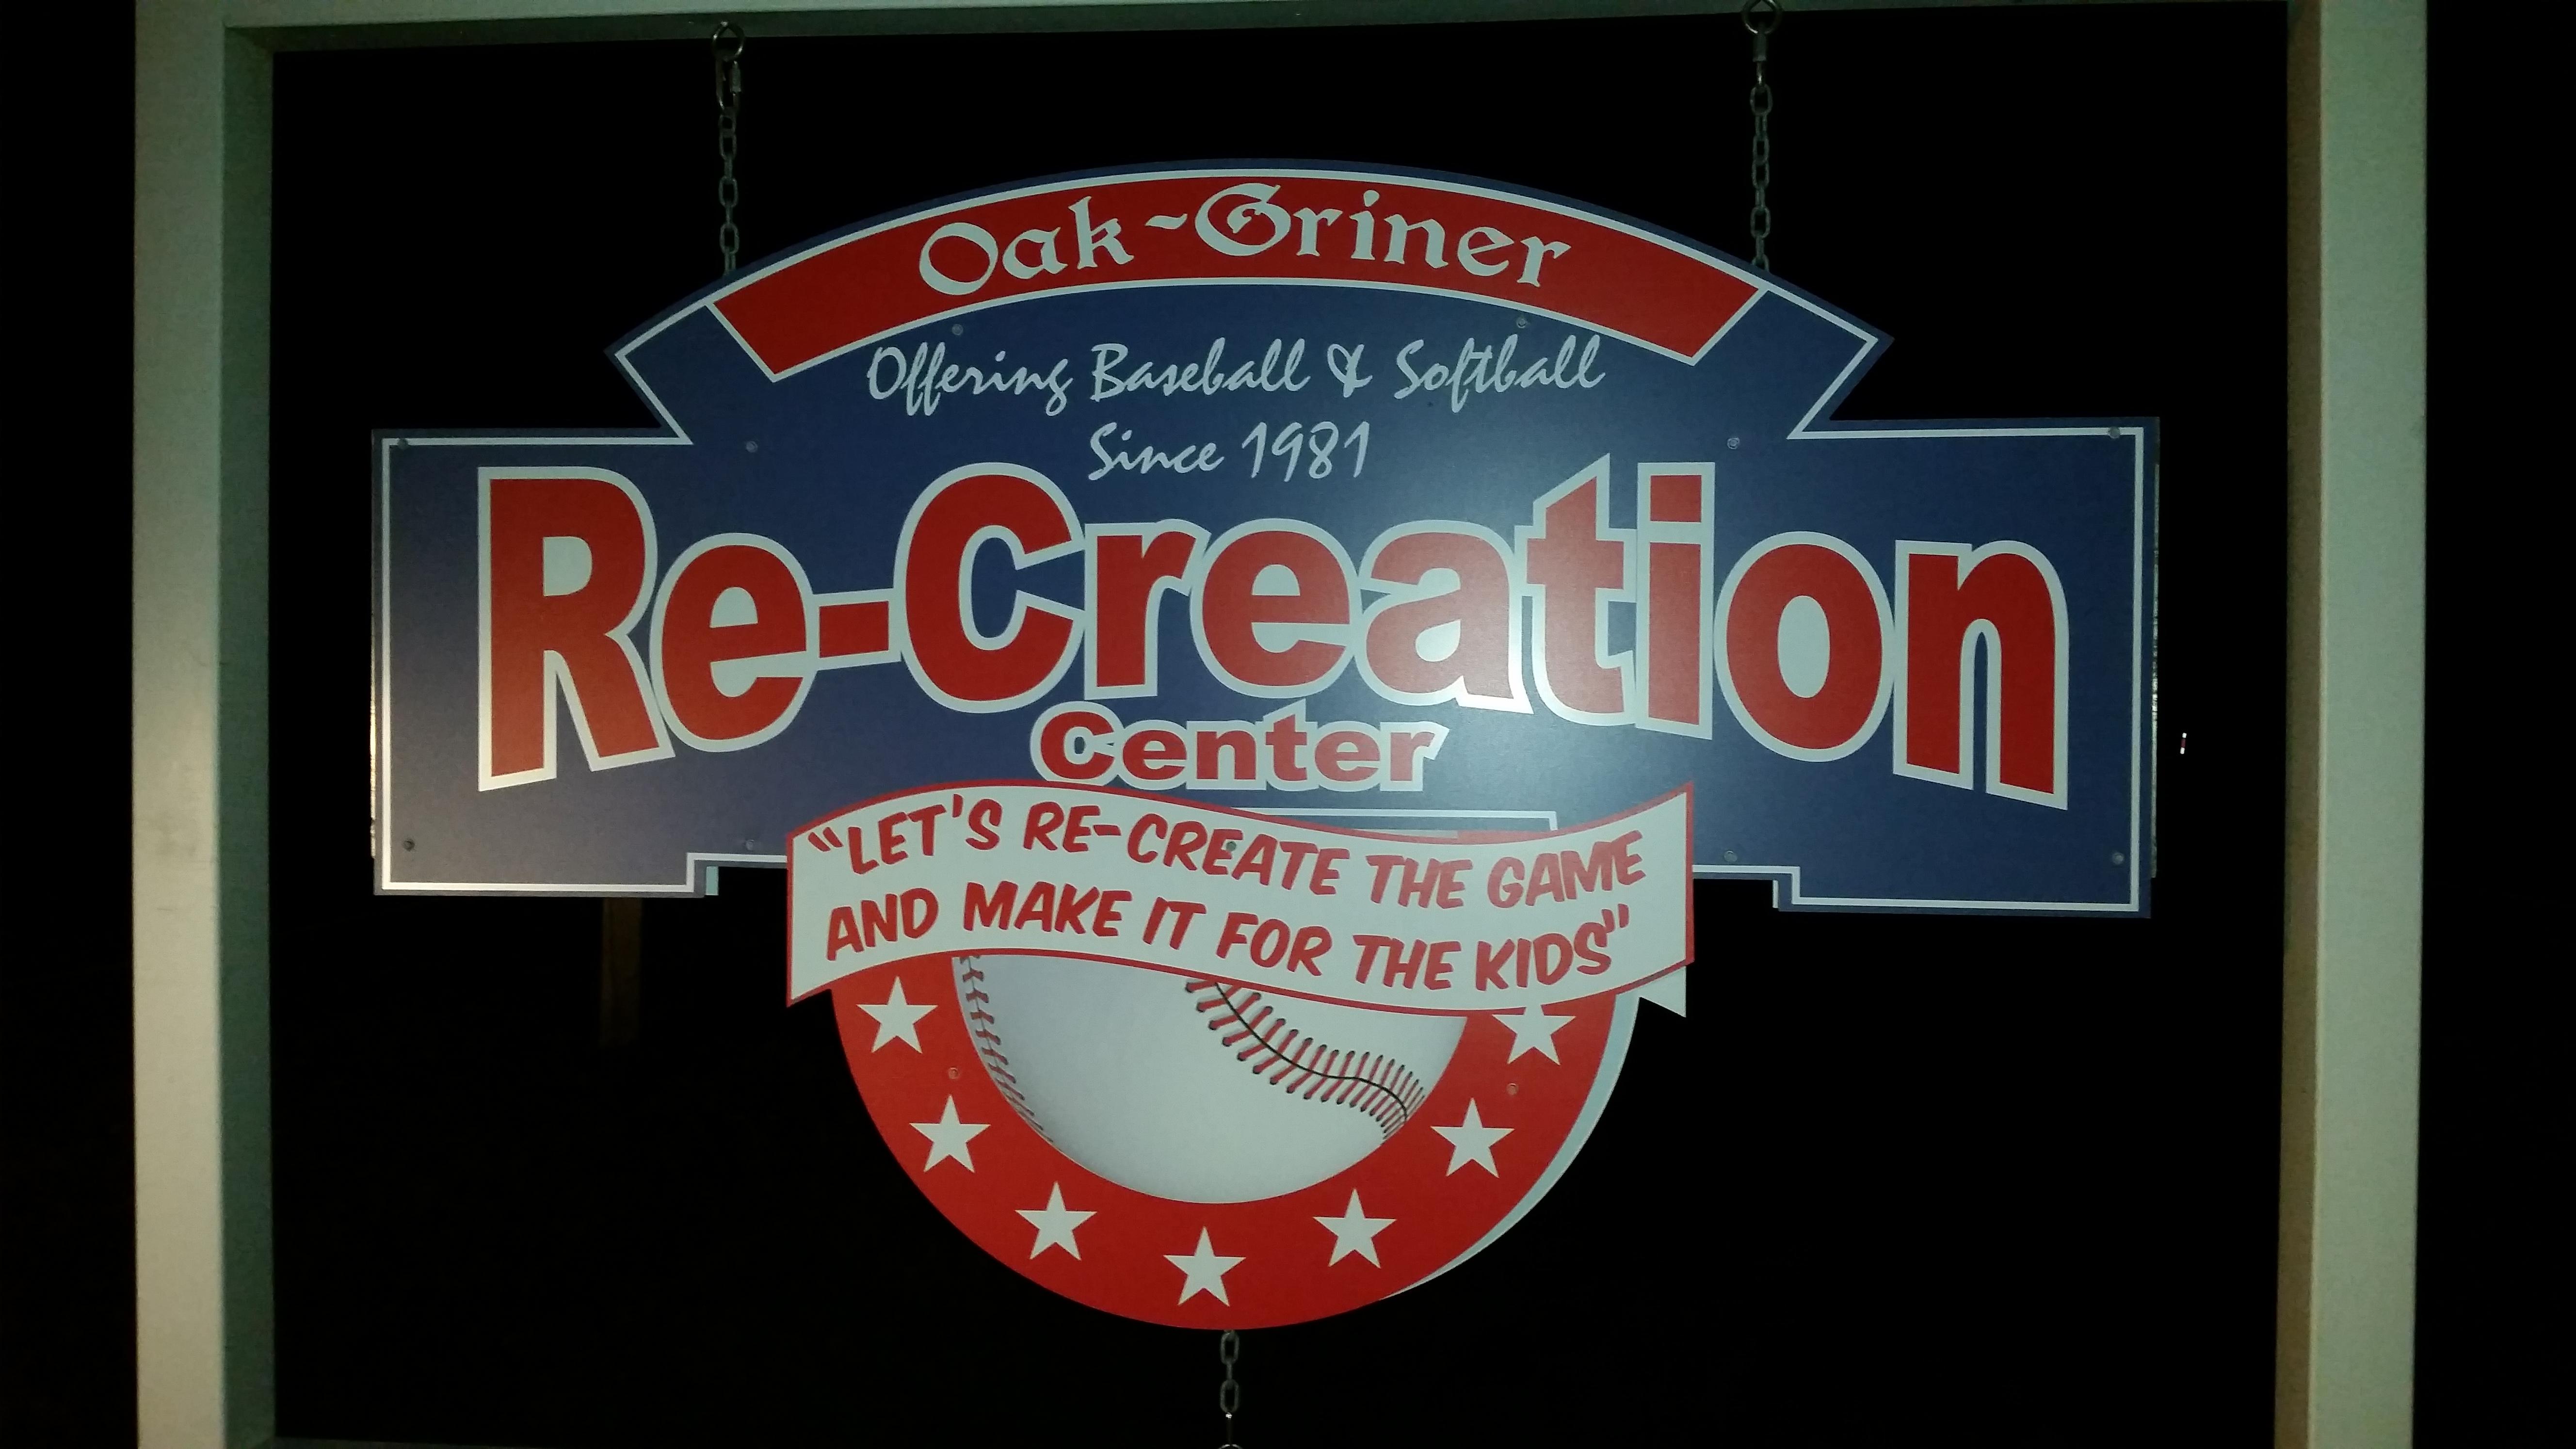 11-01-2015 Field Sponsorship-Oak-Griner Youth Baseball